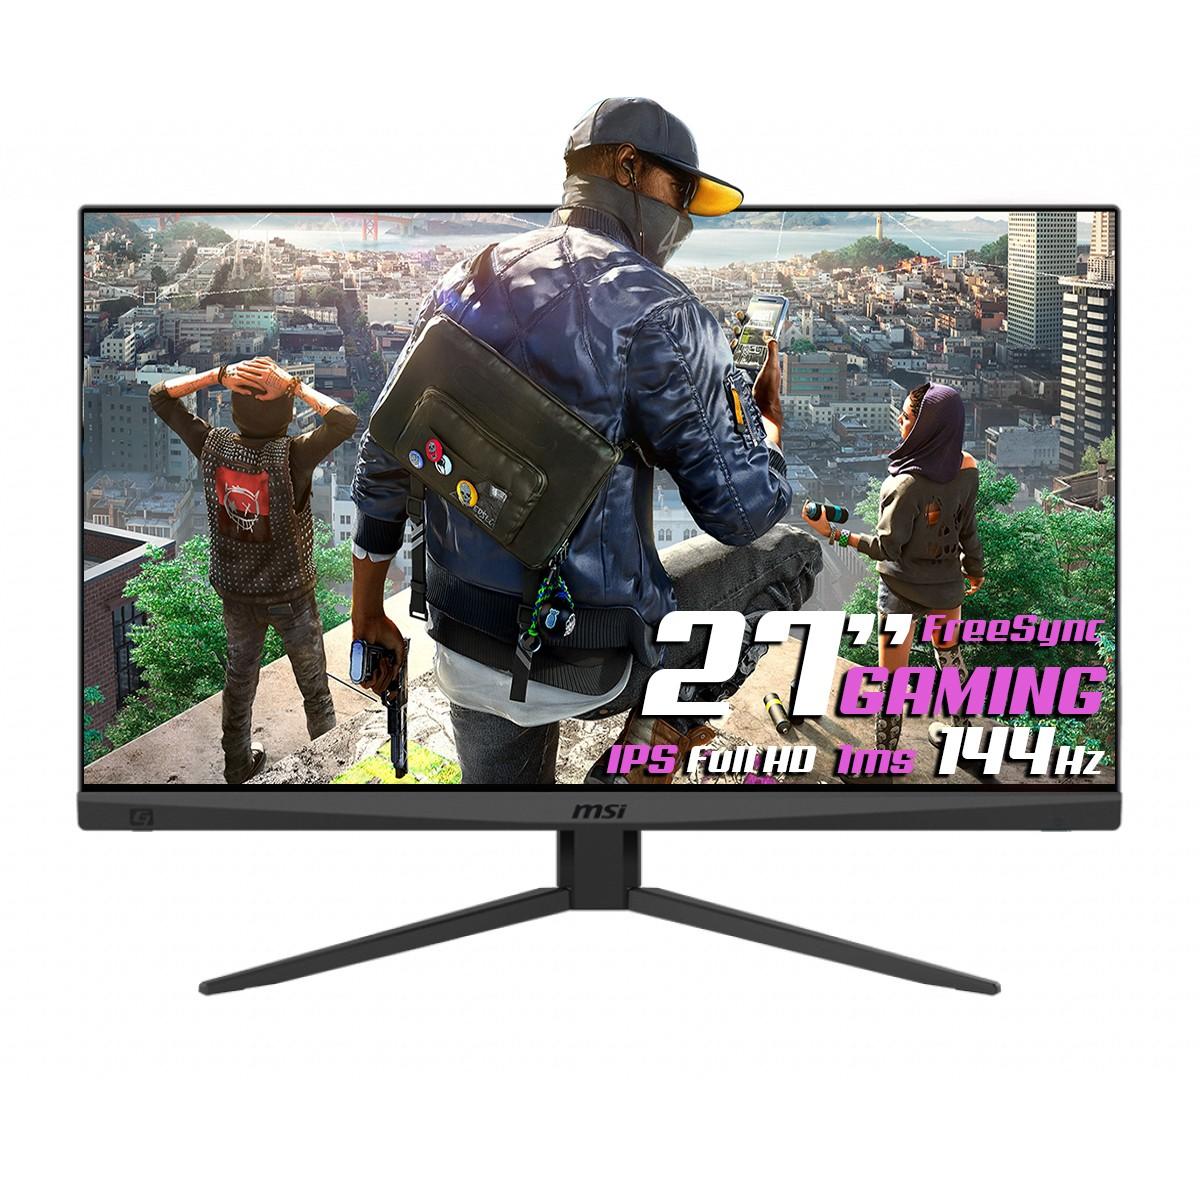 Monitor Gamer MSI Optix, 27 Pol, FullHD, 144Hz, 1ms, IPS, HDMI/DP, MAG274